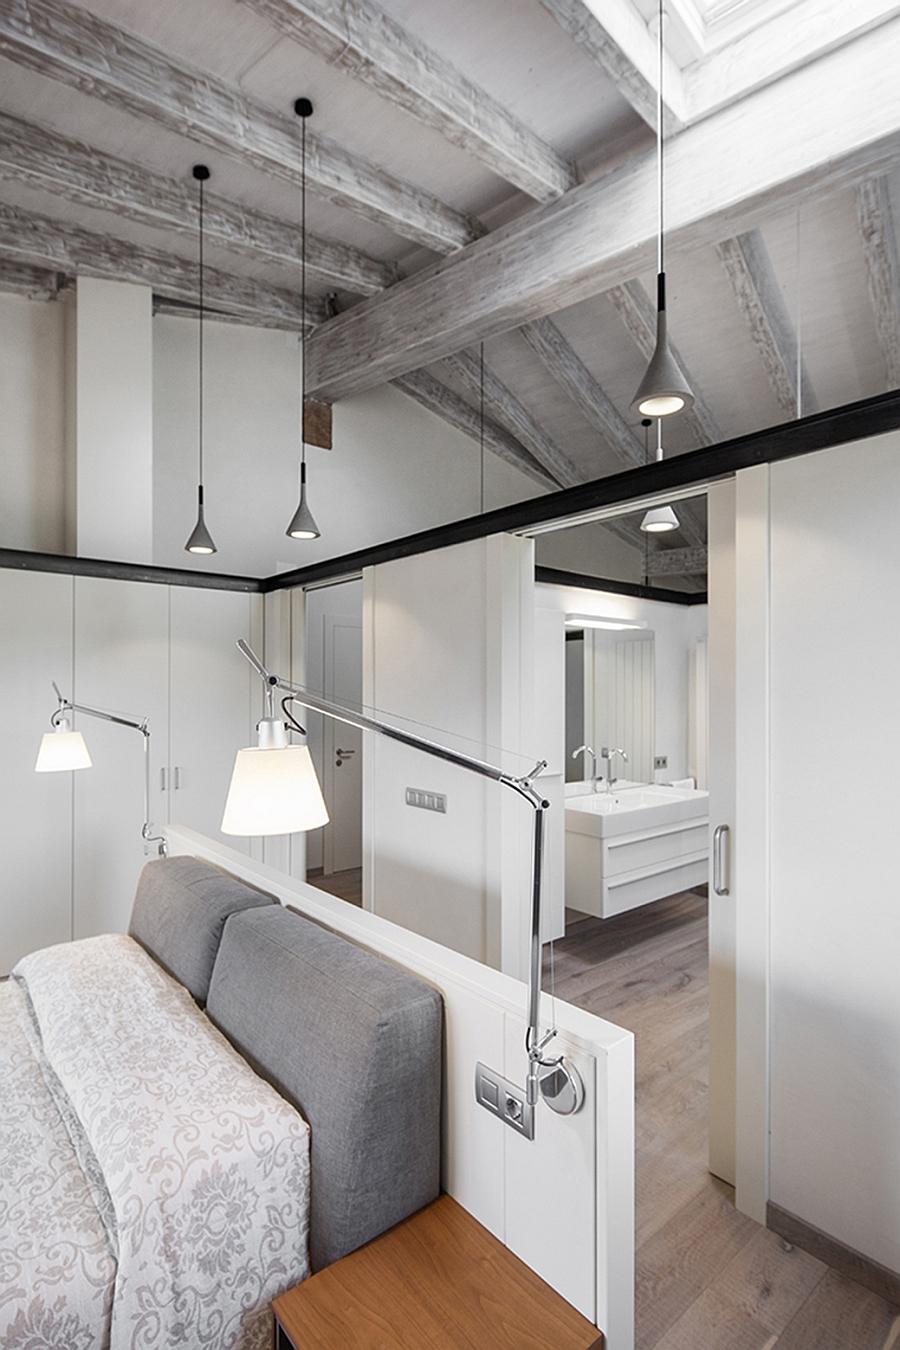 Masia espanola convertida en una casa moderna 8